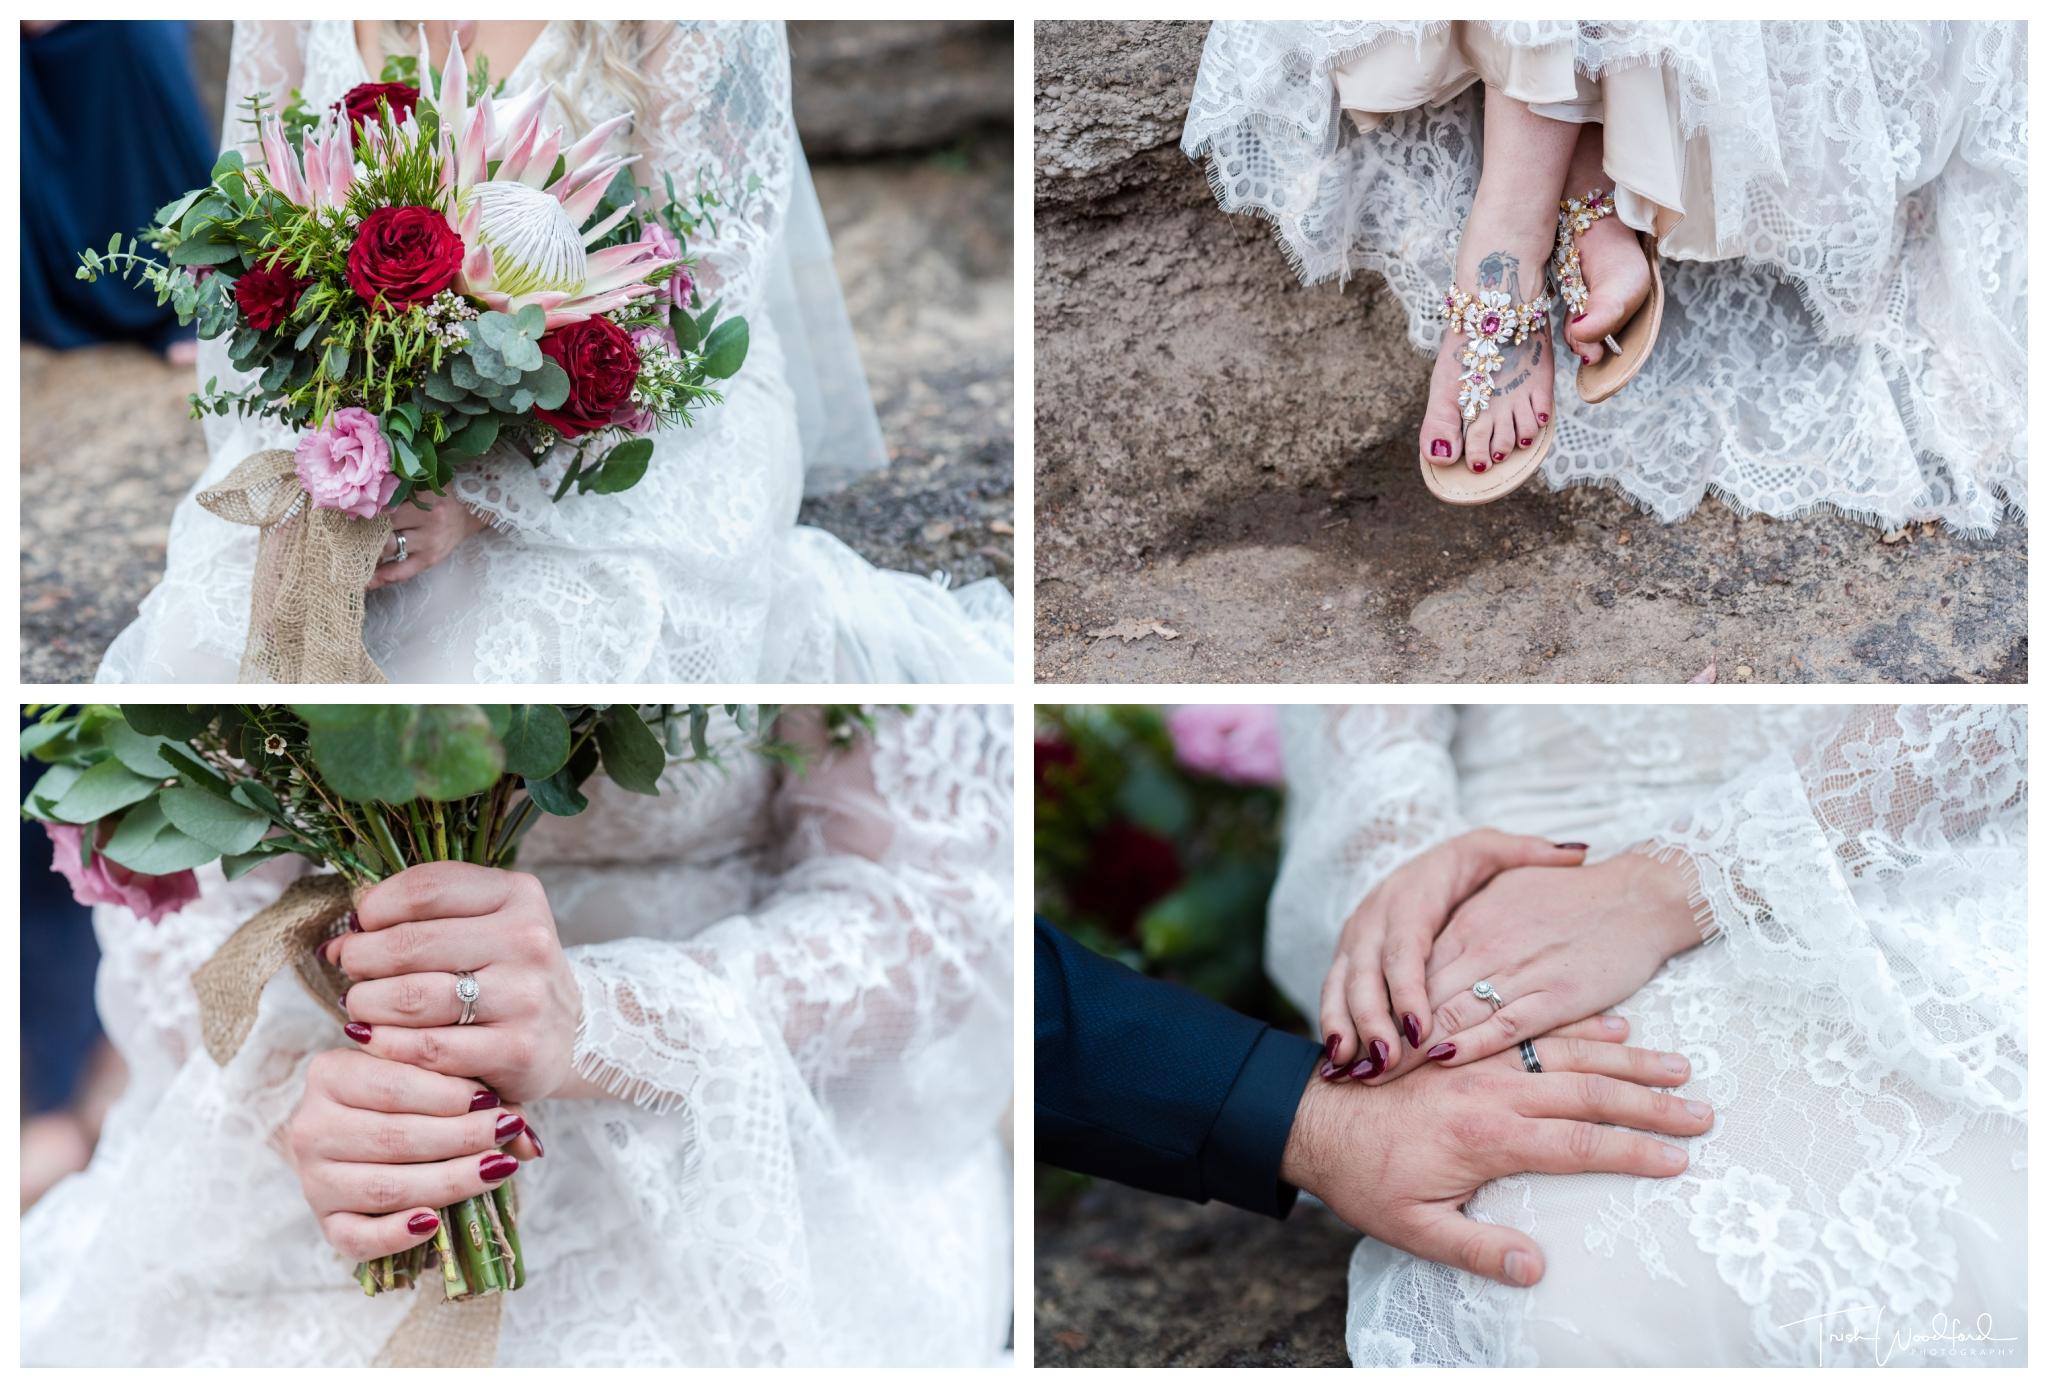 Nanga Bush Wedding Bridal Details